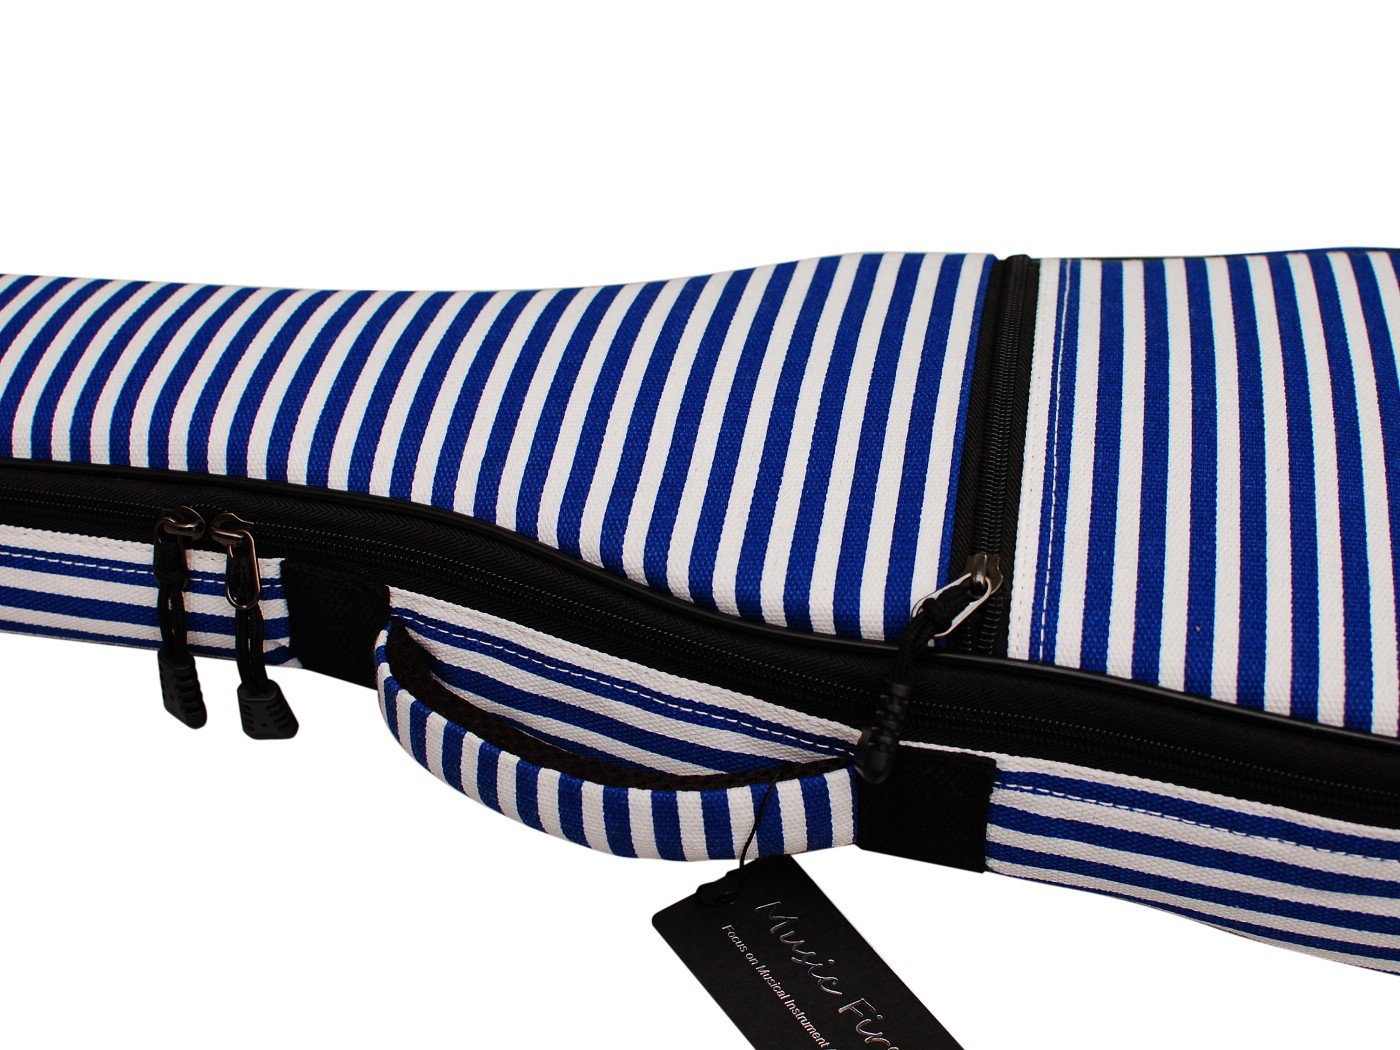 MUSIC FIRST Hand Portable 23'' Concert Cotton Canvas Blue Sailor's Striped Ukulele Bag Ukulele Cover Ukulele Case V2.0 by MUSIC FIRST (Image #5)